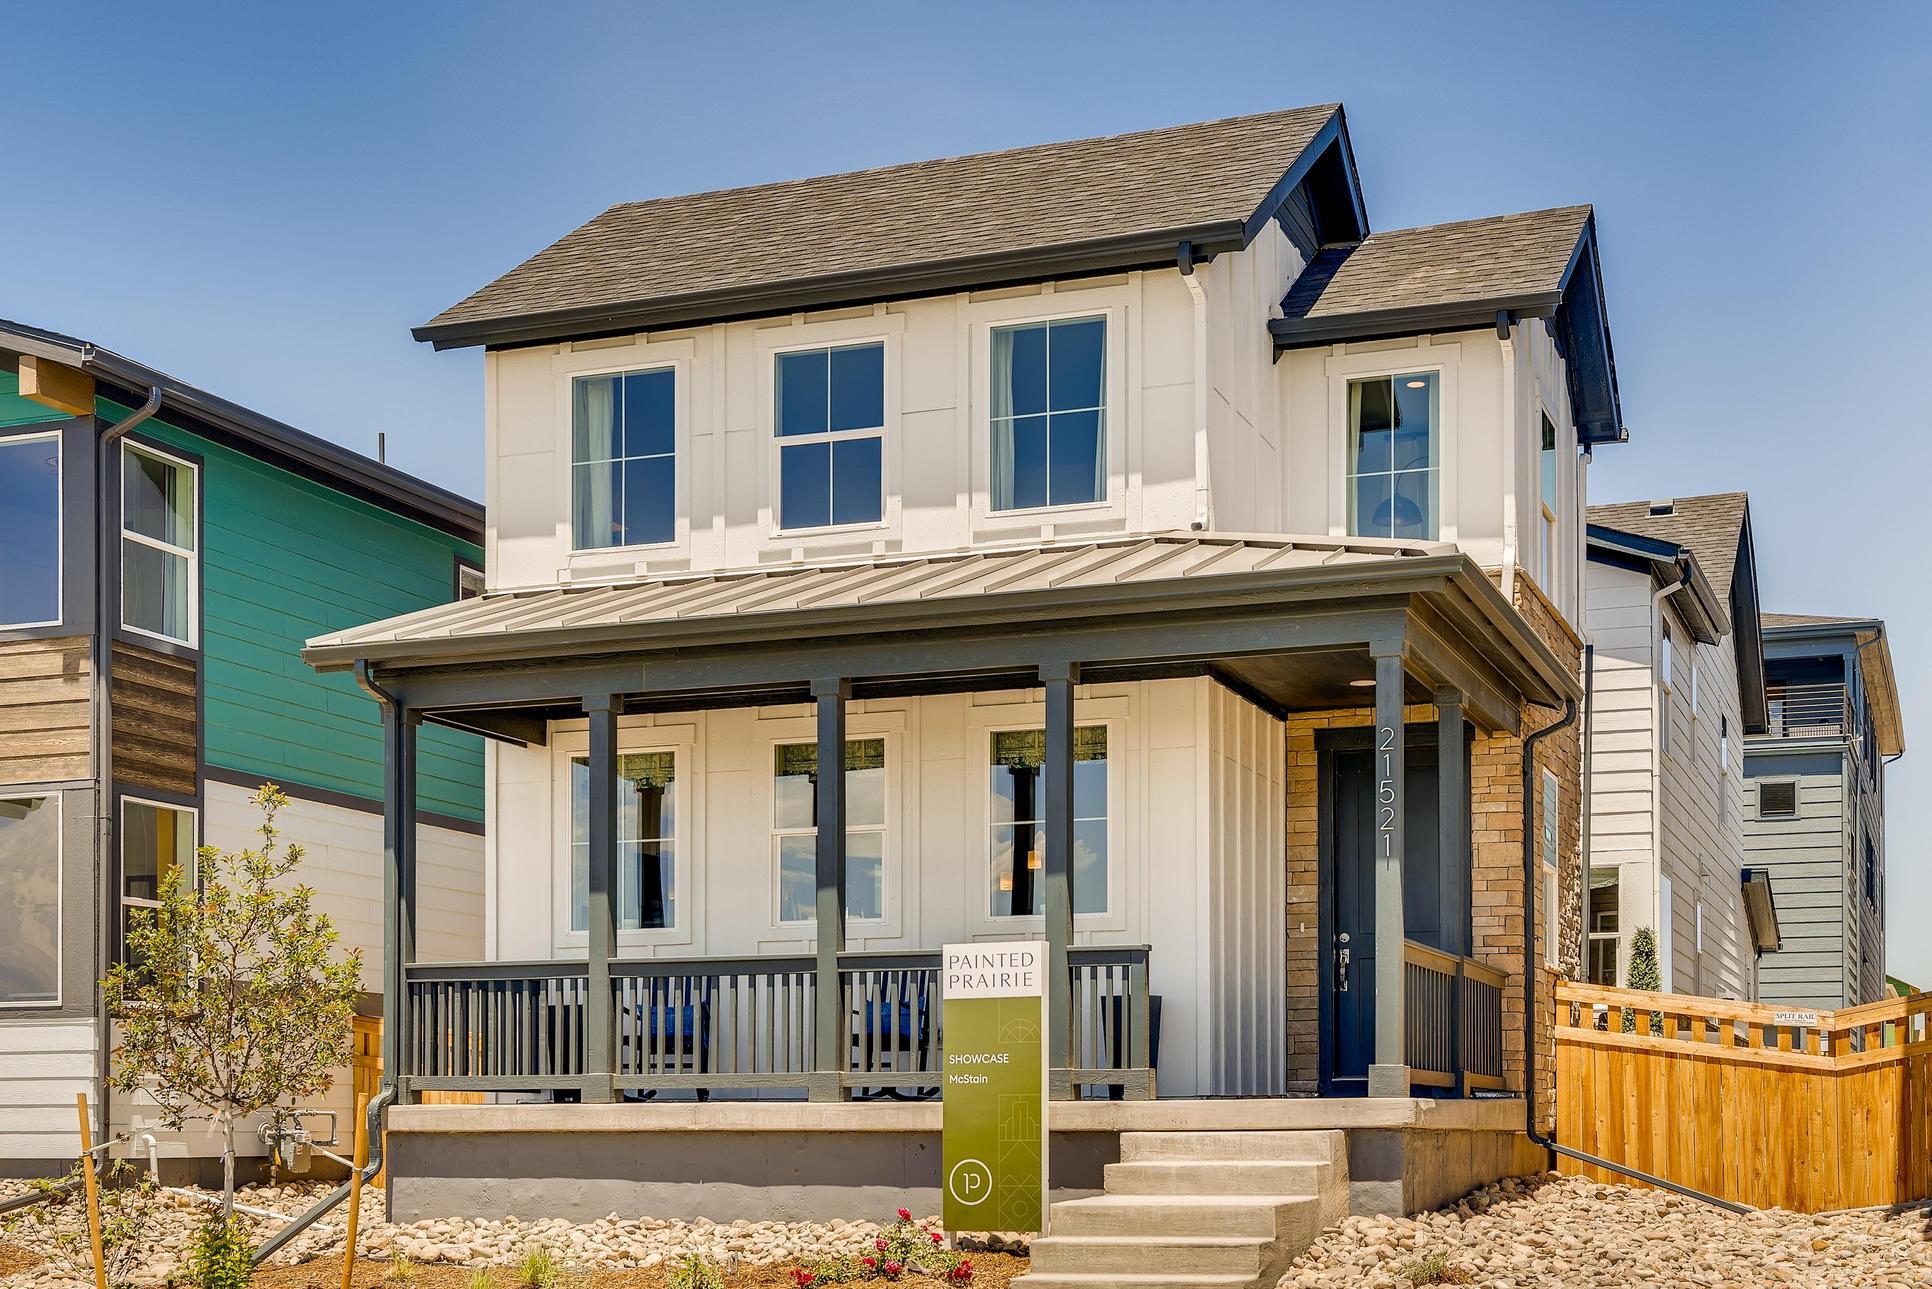 Showcase Model Home at Painted Prairie